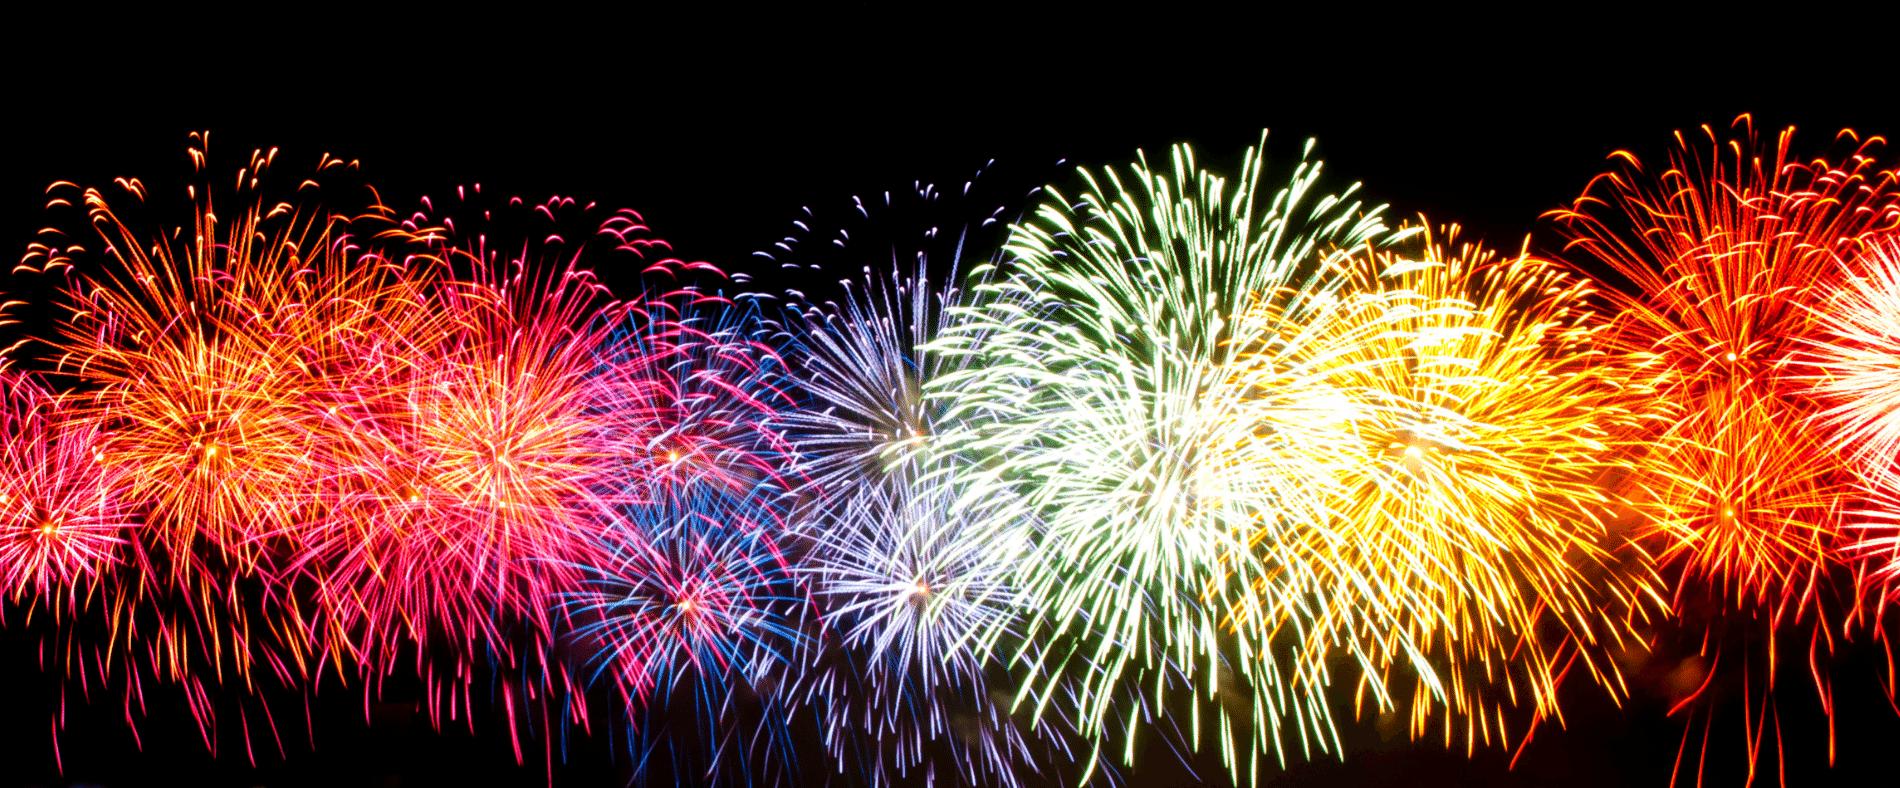 Say Goodbye to 2020!! HOA sponsored New Year's Eve Fireworks.